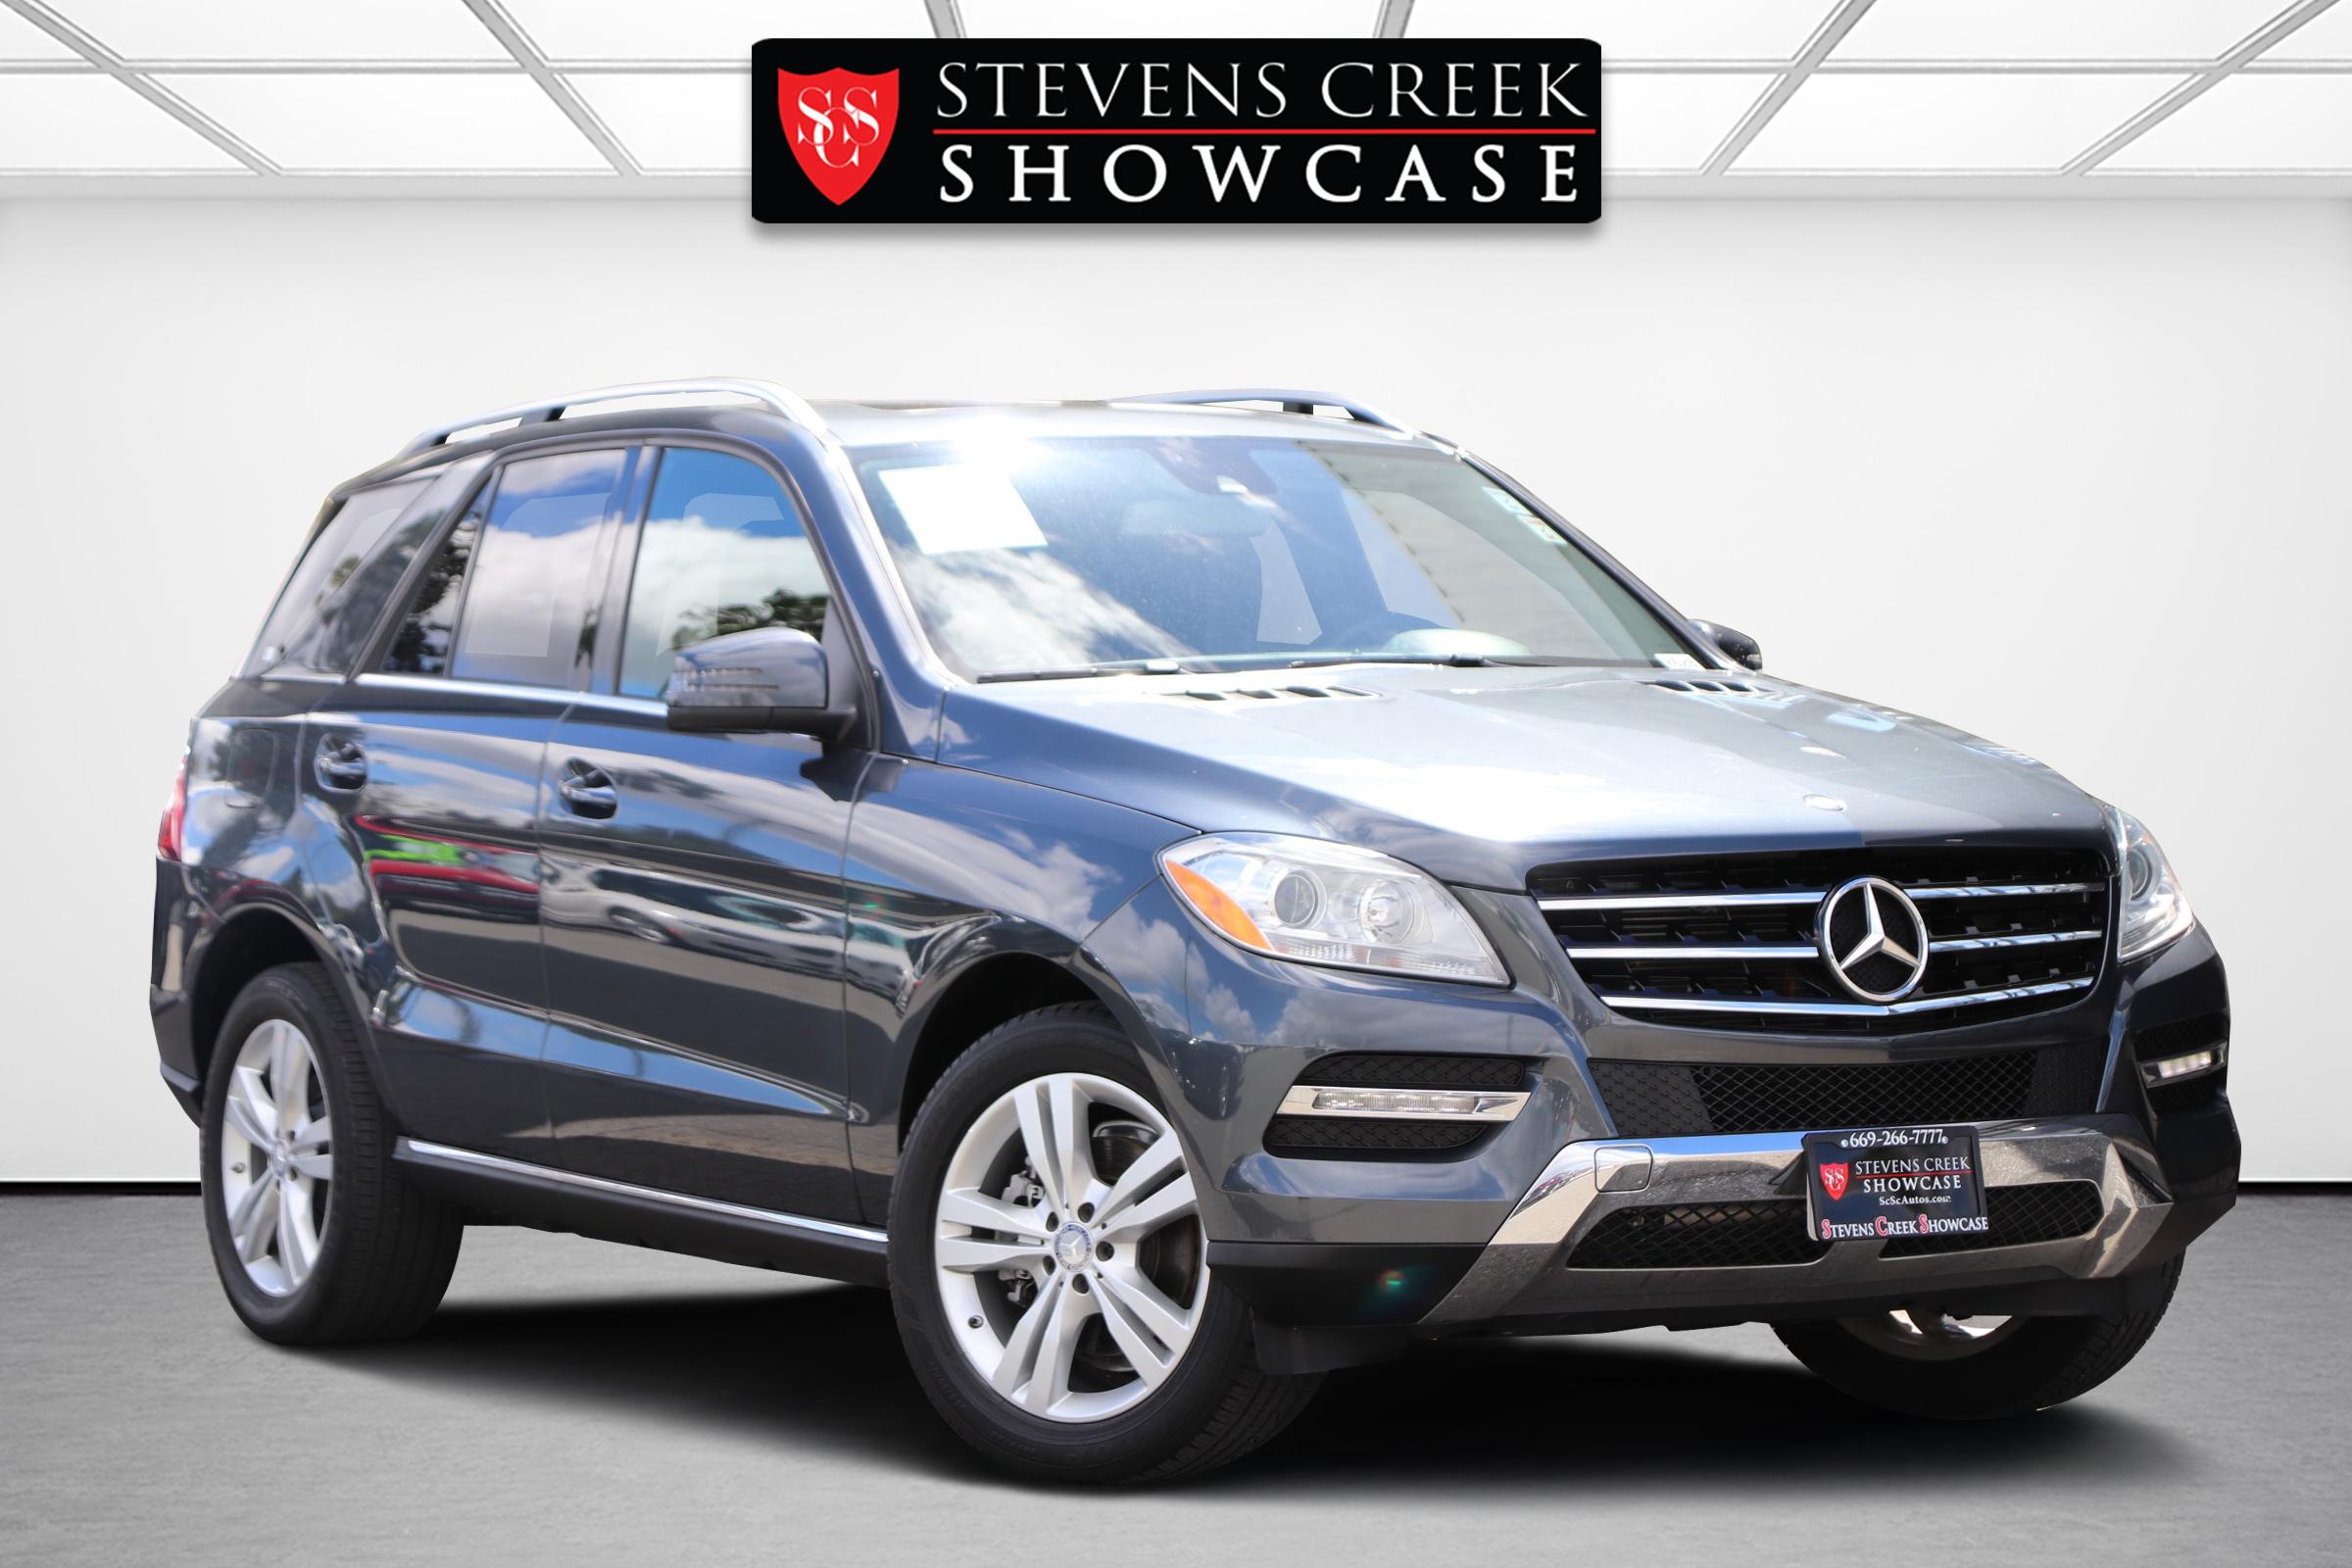 Mercedes Stevens Creek >> 2014 Mercedes Benz Ml 350 Suv Stevens Creek Showcase